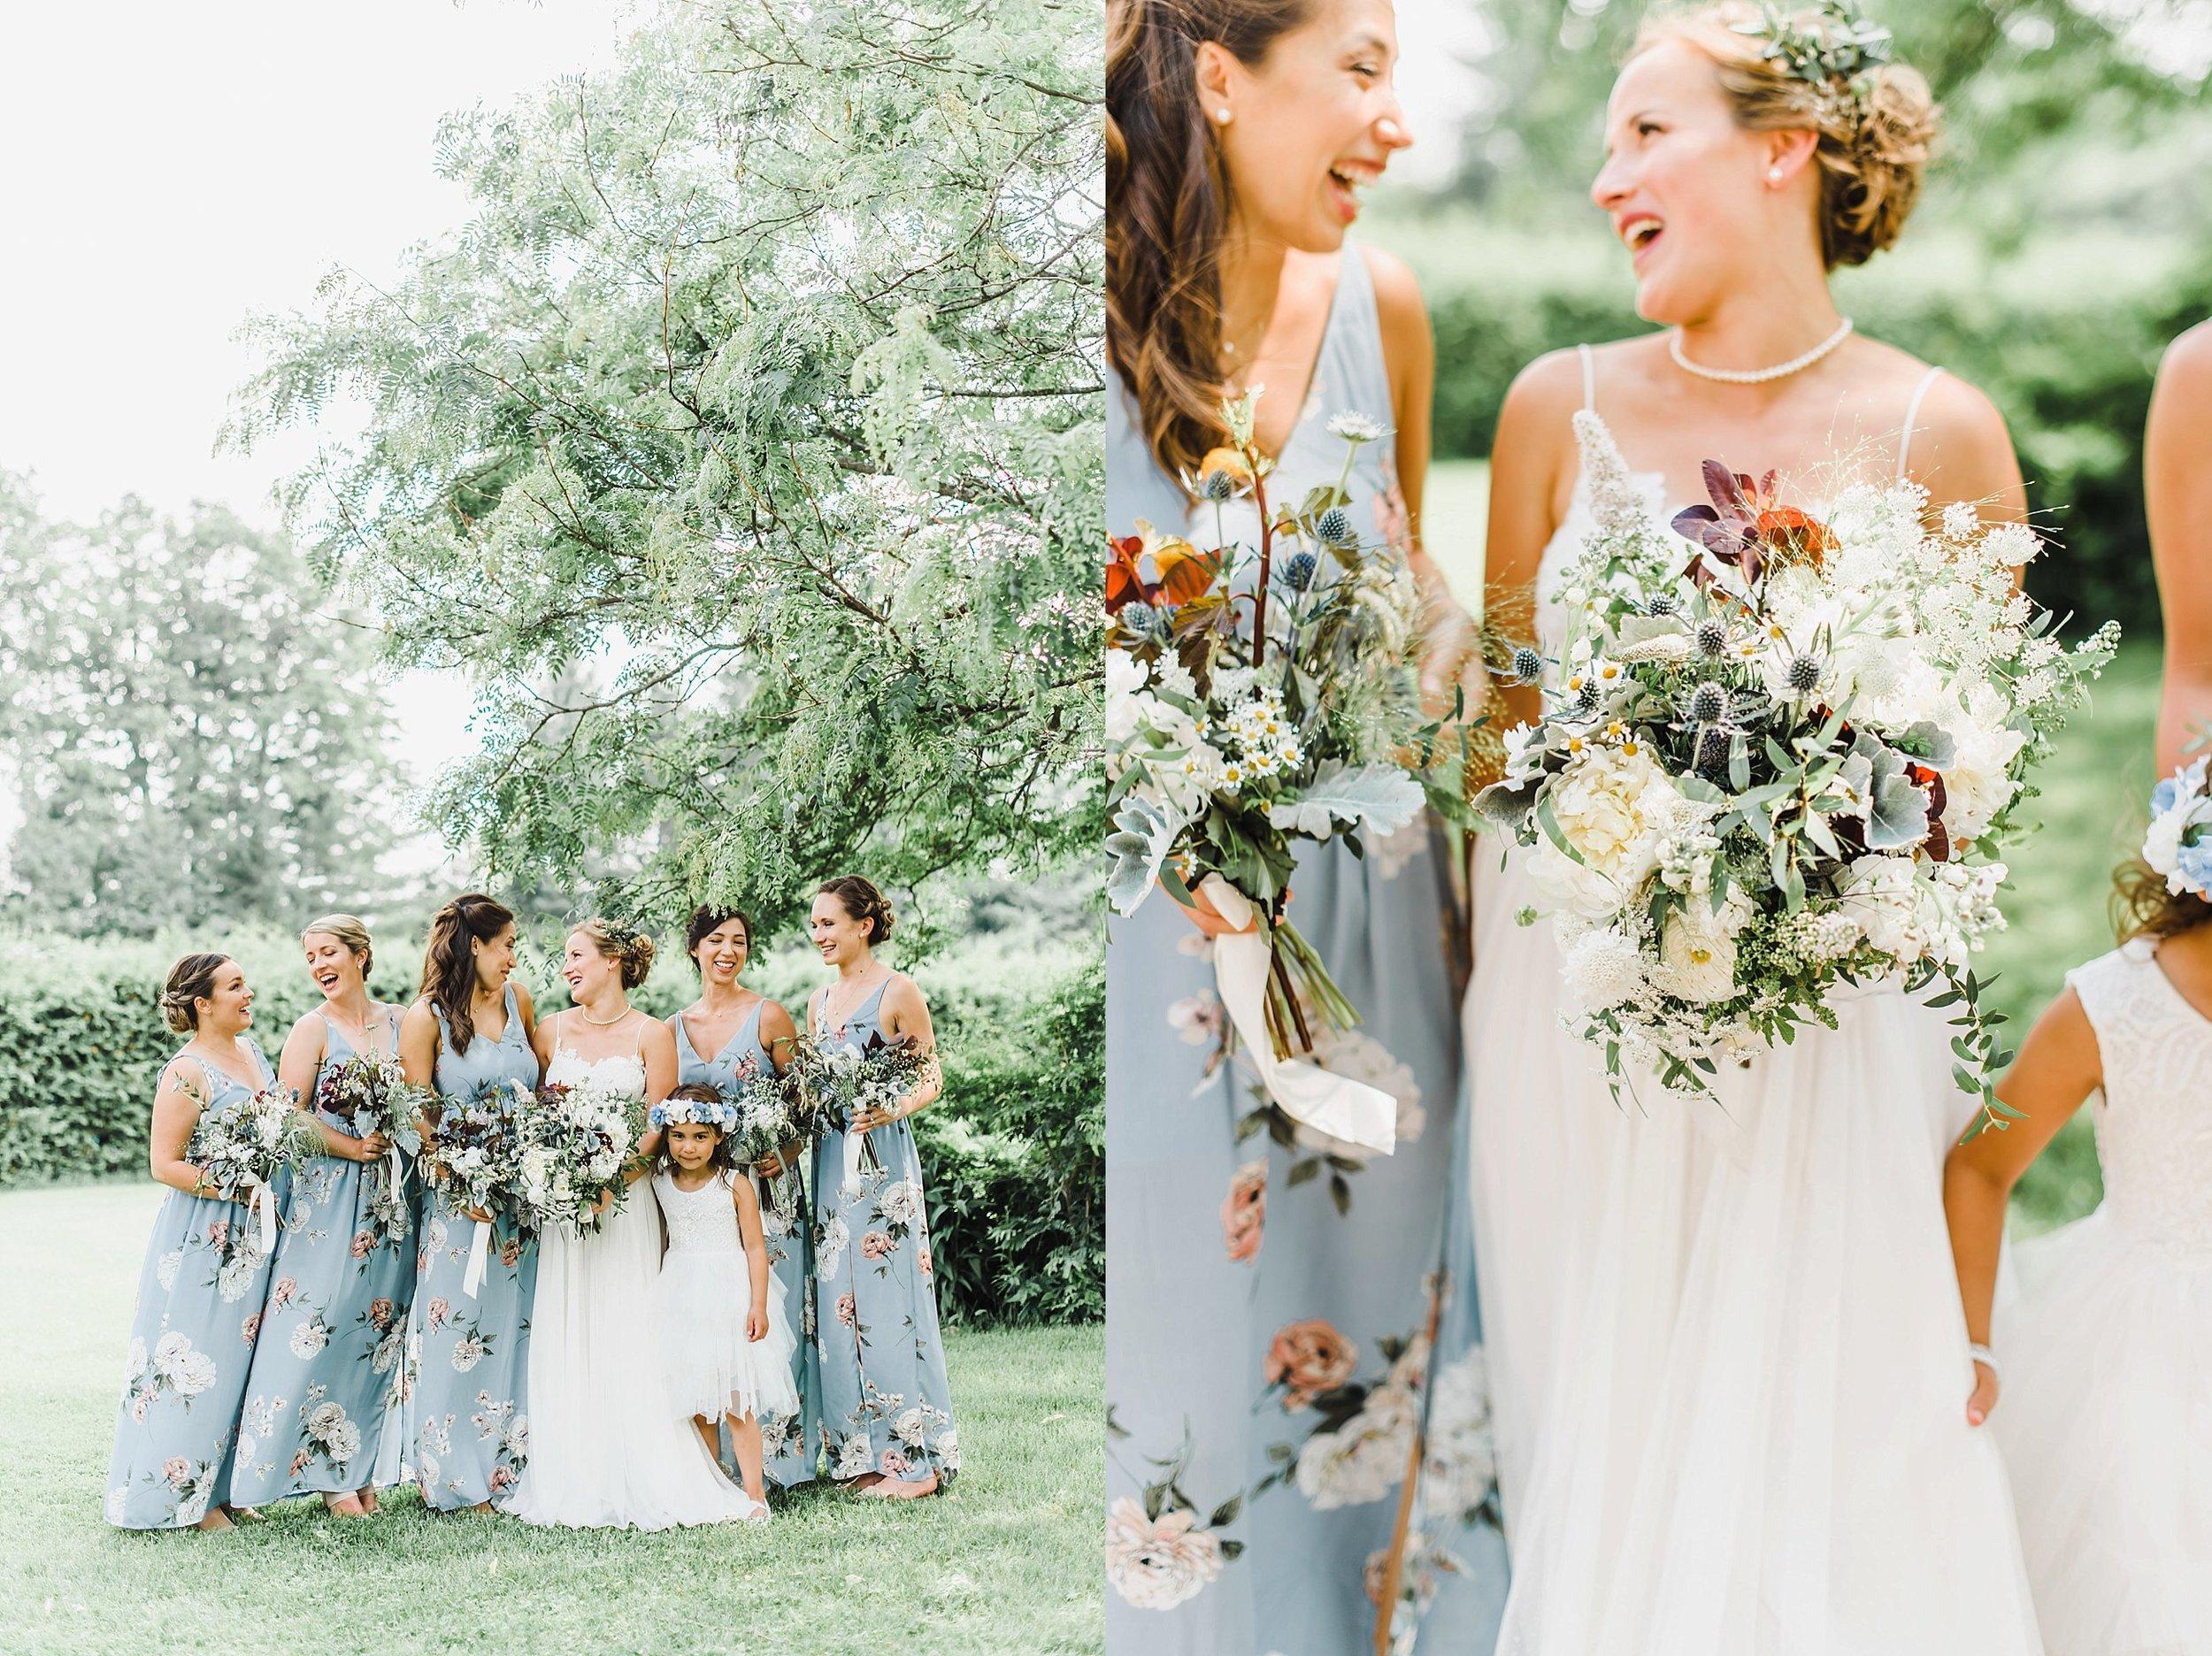 light airy indie fine art ottawa wedding photographer | Ali and Batoul Photography_0828.jpg